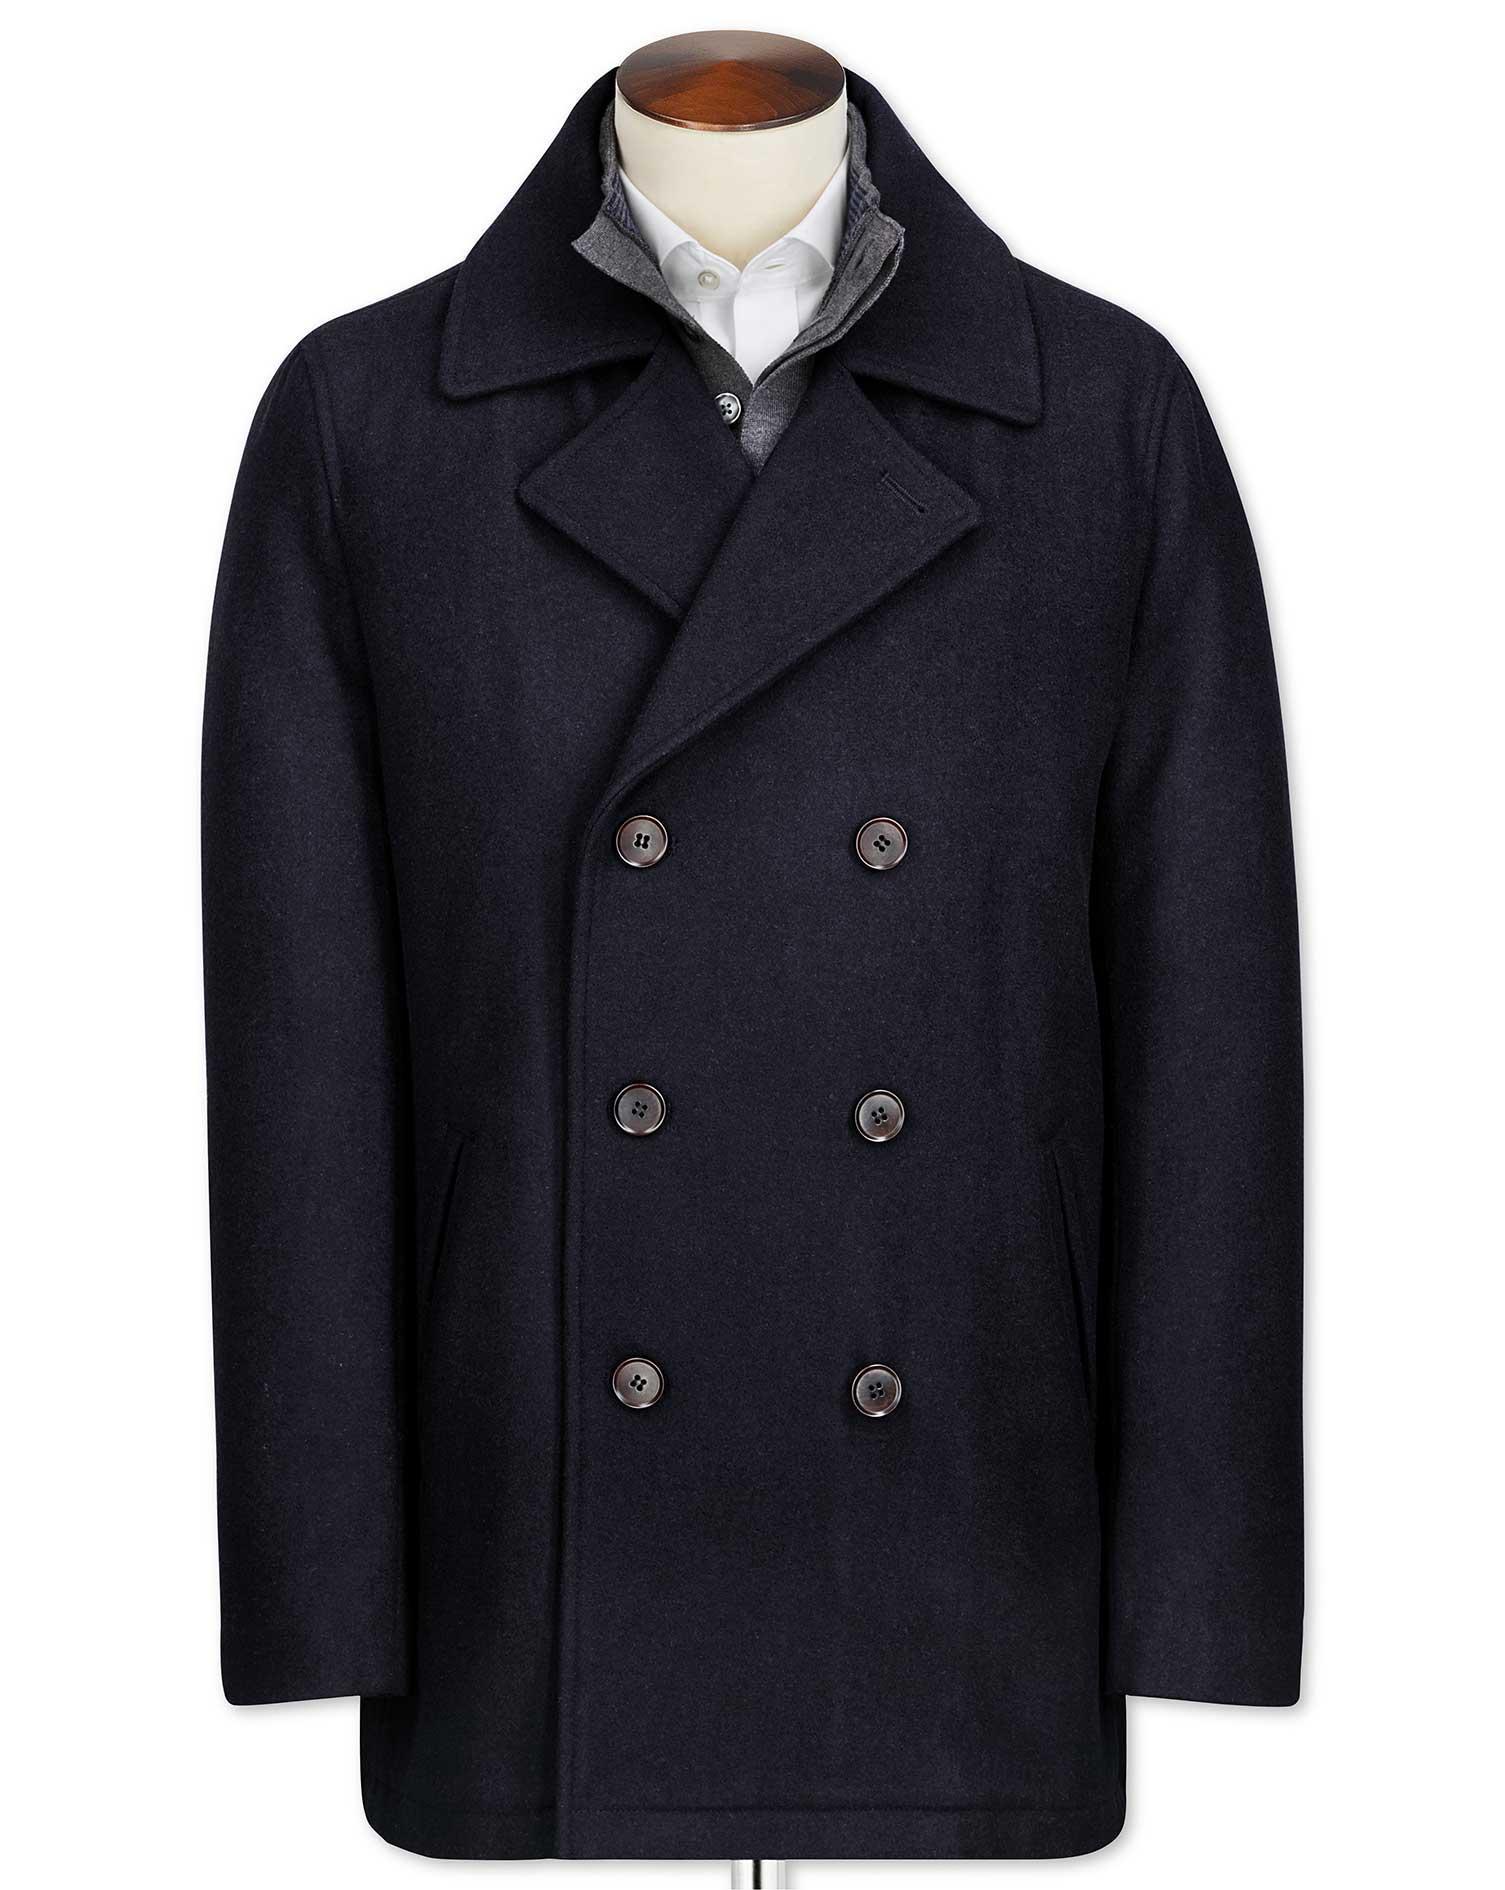 Navy Wool Pea Wool Coat Size 36 Regular by Charles Tyrwhitt